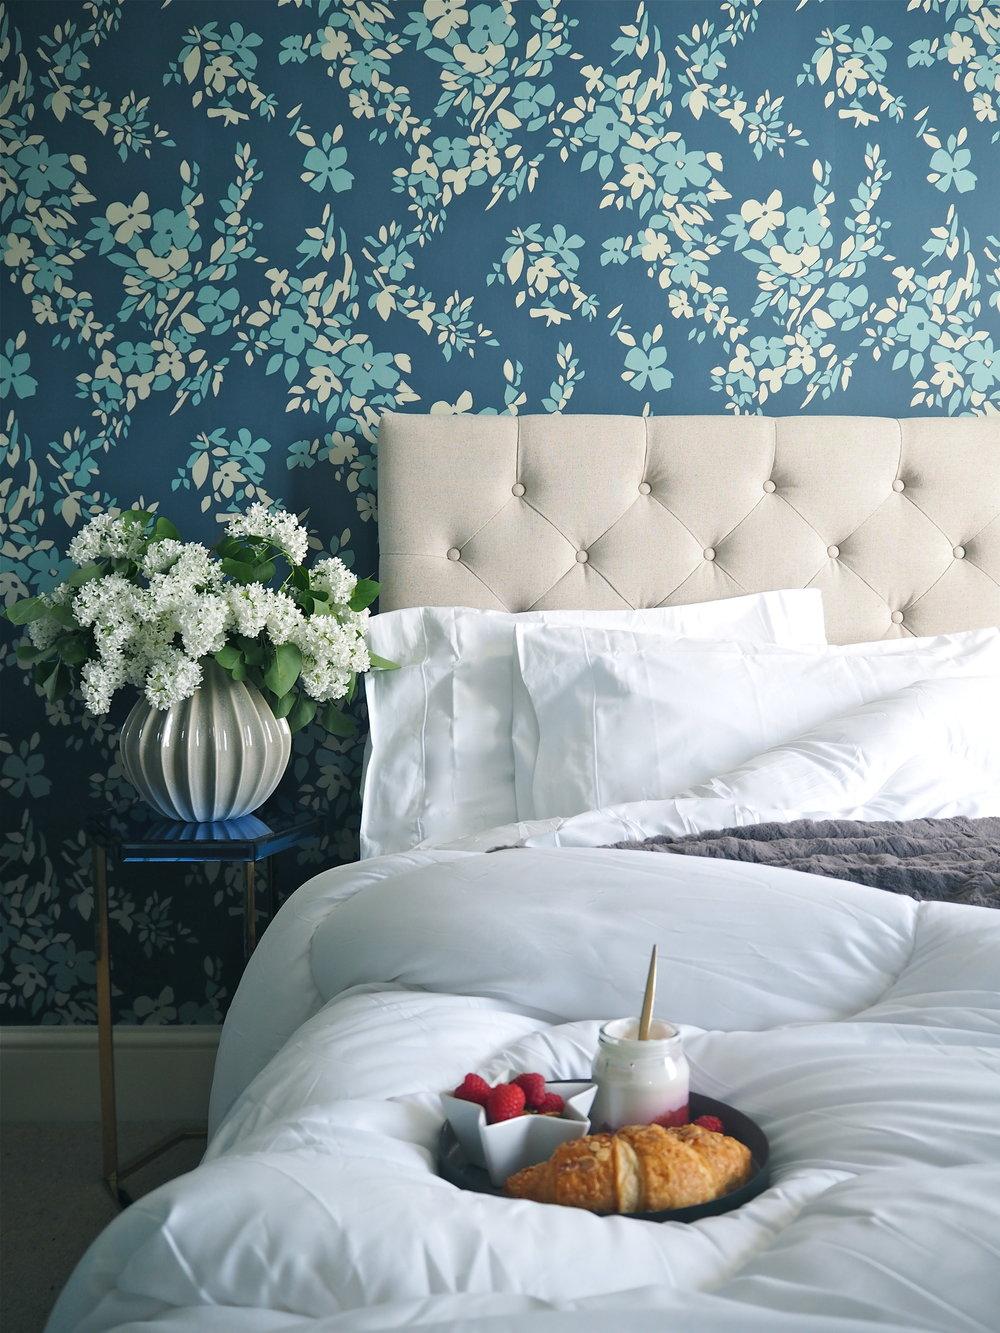 Fine Bedding Company Eco Duvet Review